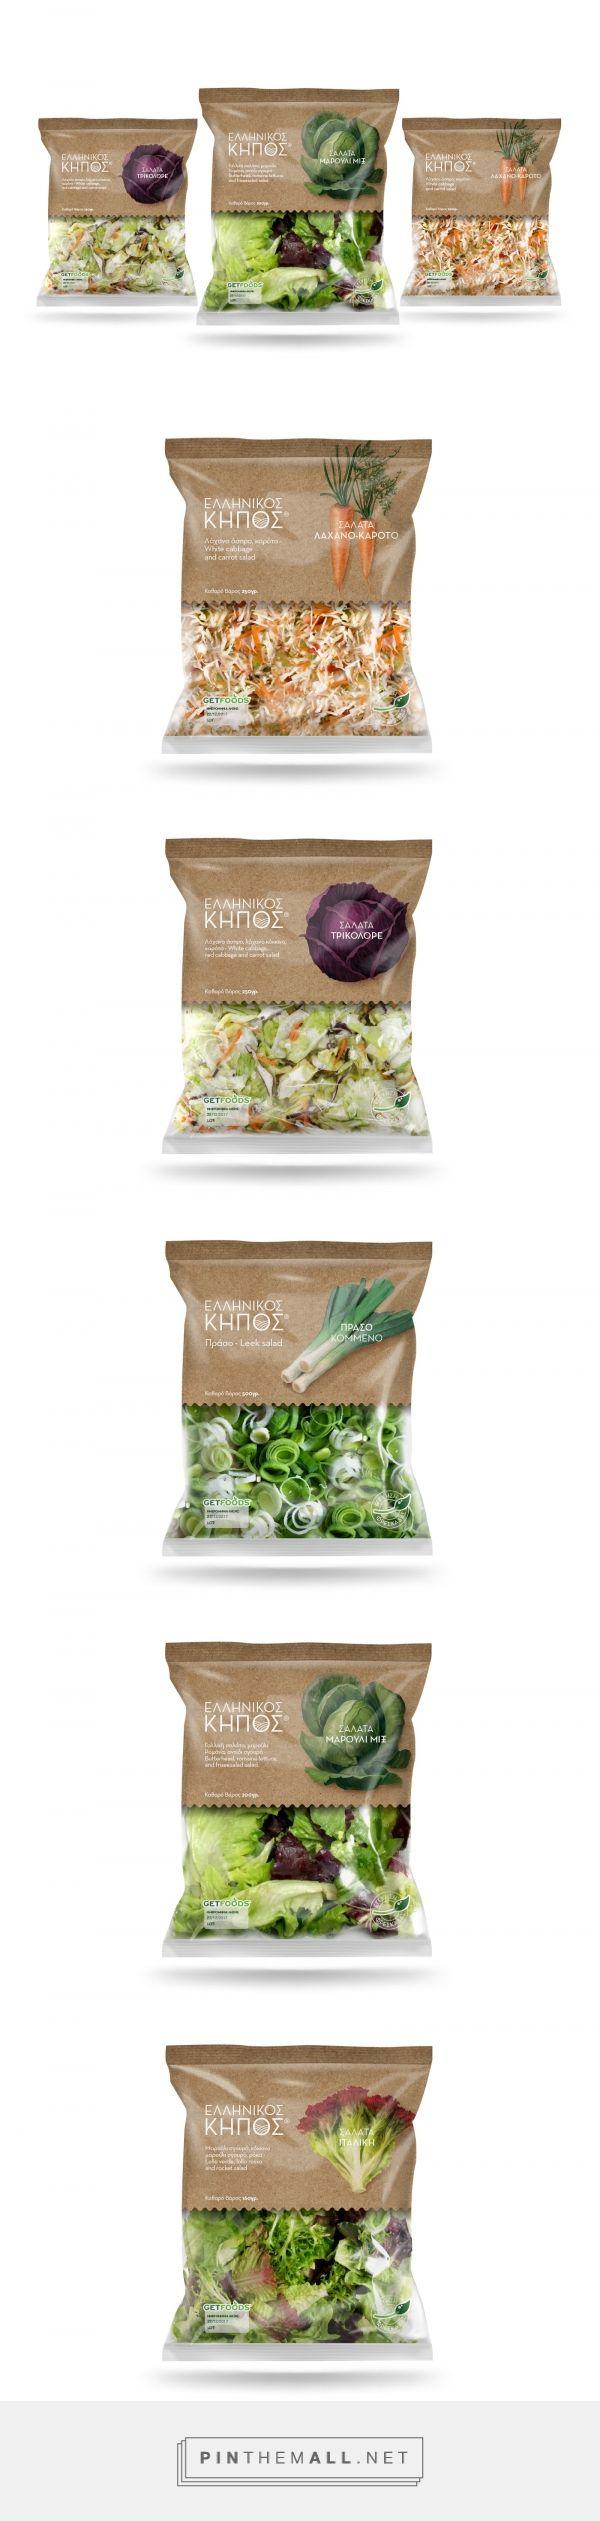 ELLINIKOS KIPOS Salad packaging design by Superfy - http://www.packagingoftheworld.com/2017/10/ellinikos-kipos-salads.html